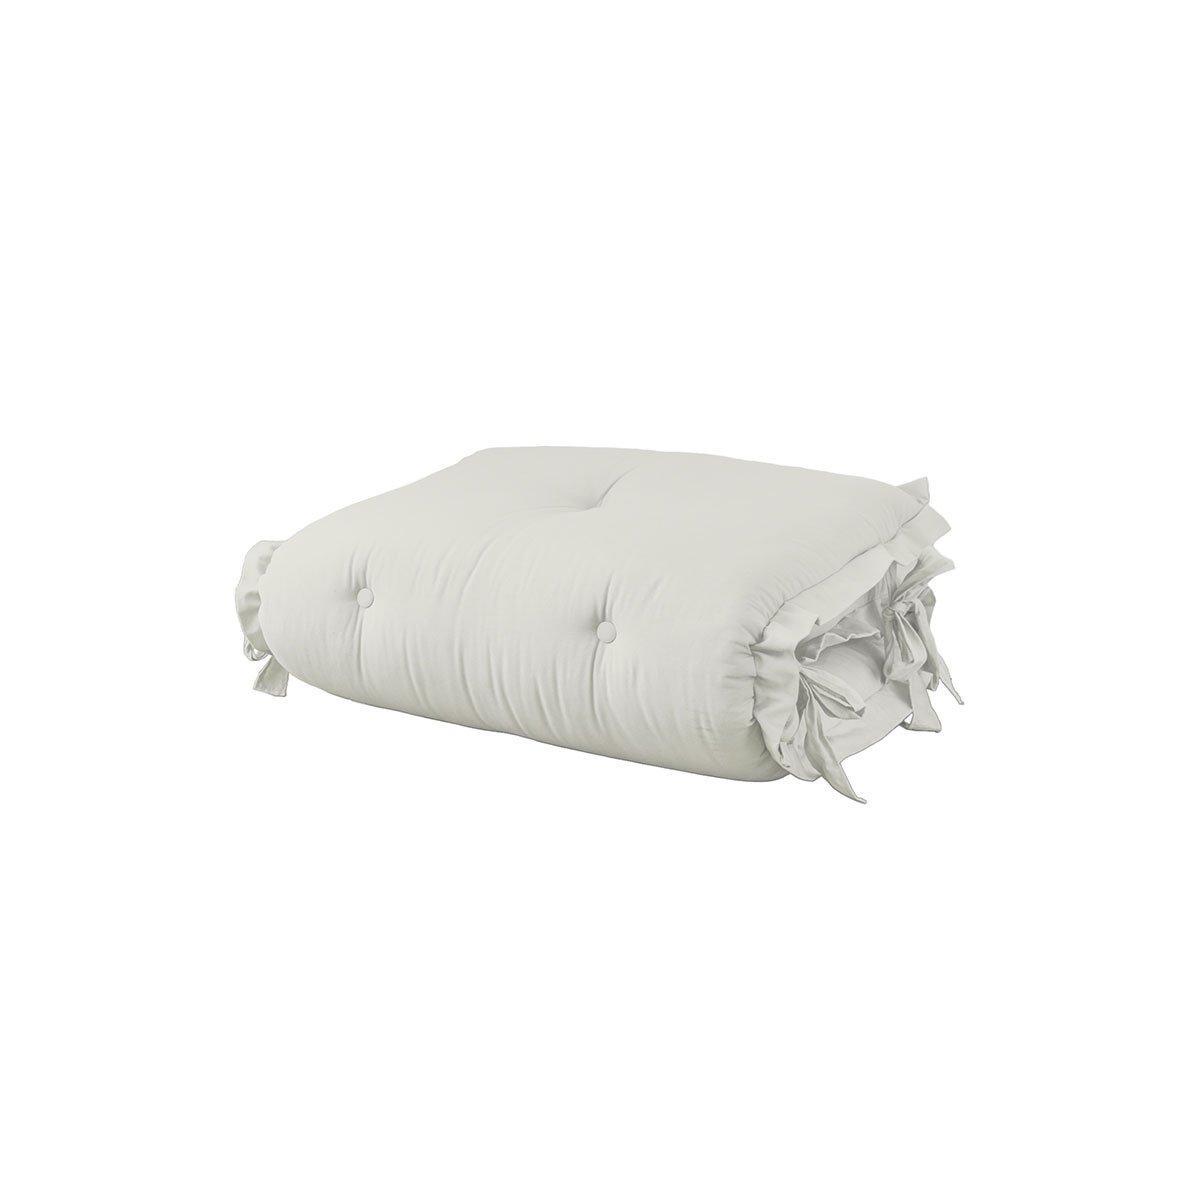 Variabilný matrac Sit And Sleep – Natural